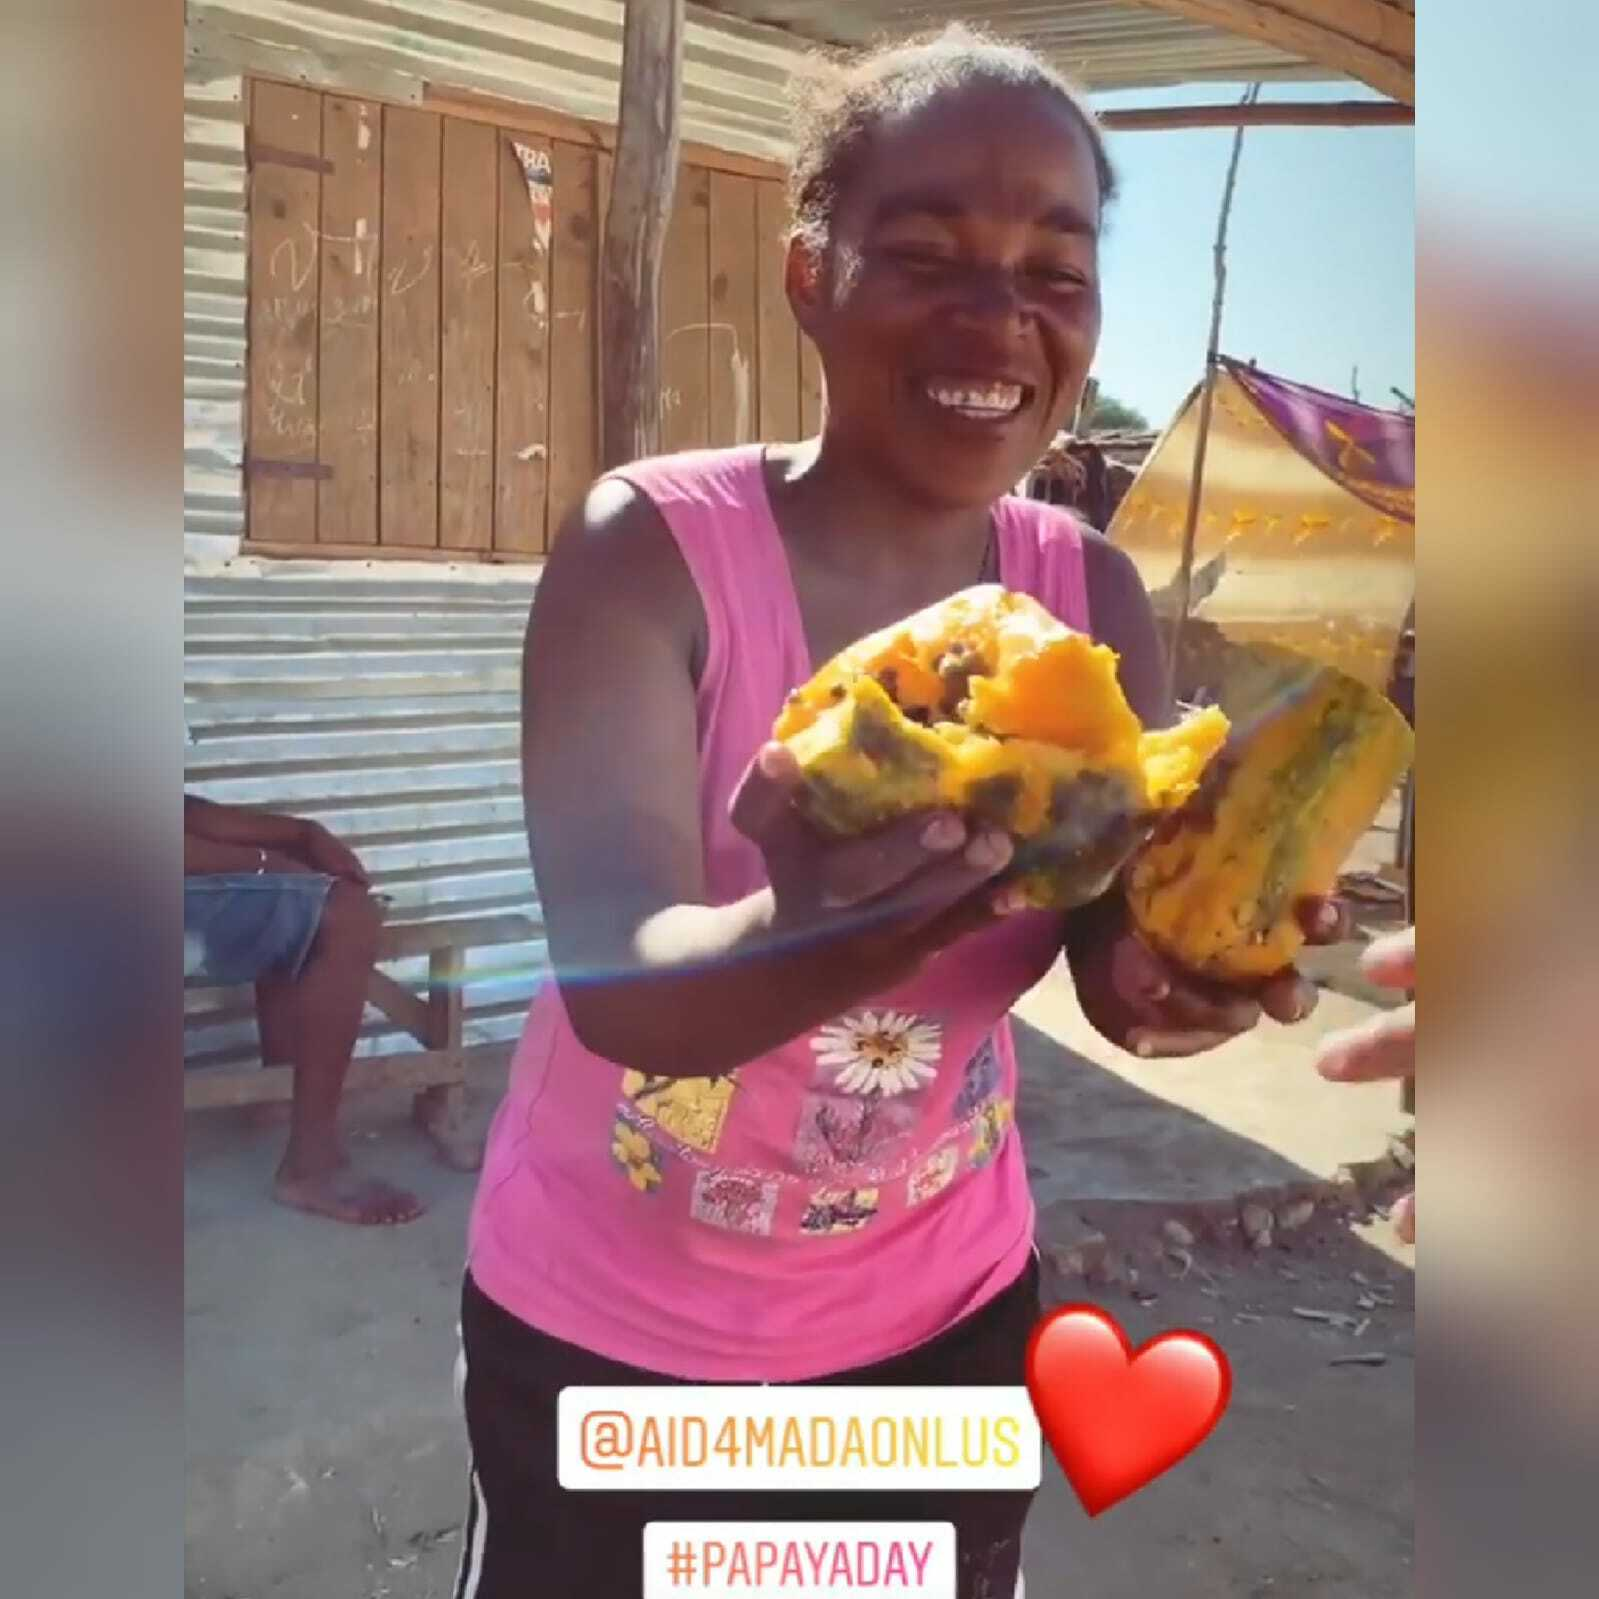 In Agricoltura MadagascarUn Day Papaya Noi Indimenticabile Siamo Nwn80XOPk